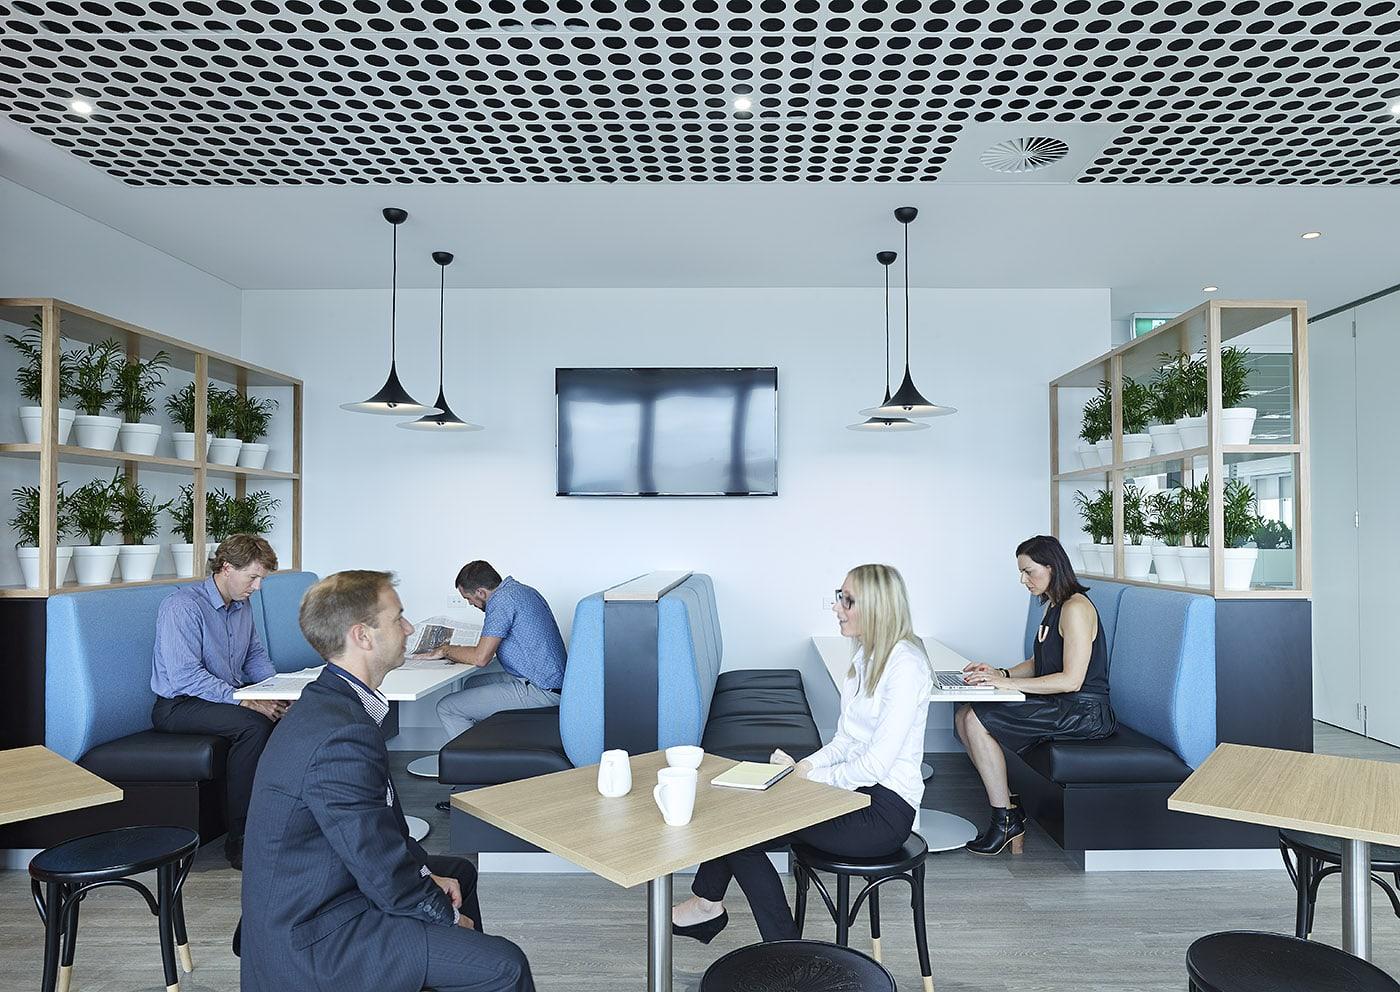 Ausure Brisbane Tenant Representation, Interior Design, Project & Construction Management Project Image 4 by PCG.jpg